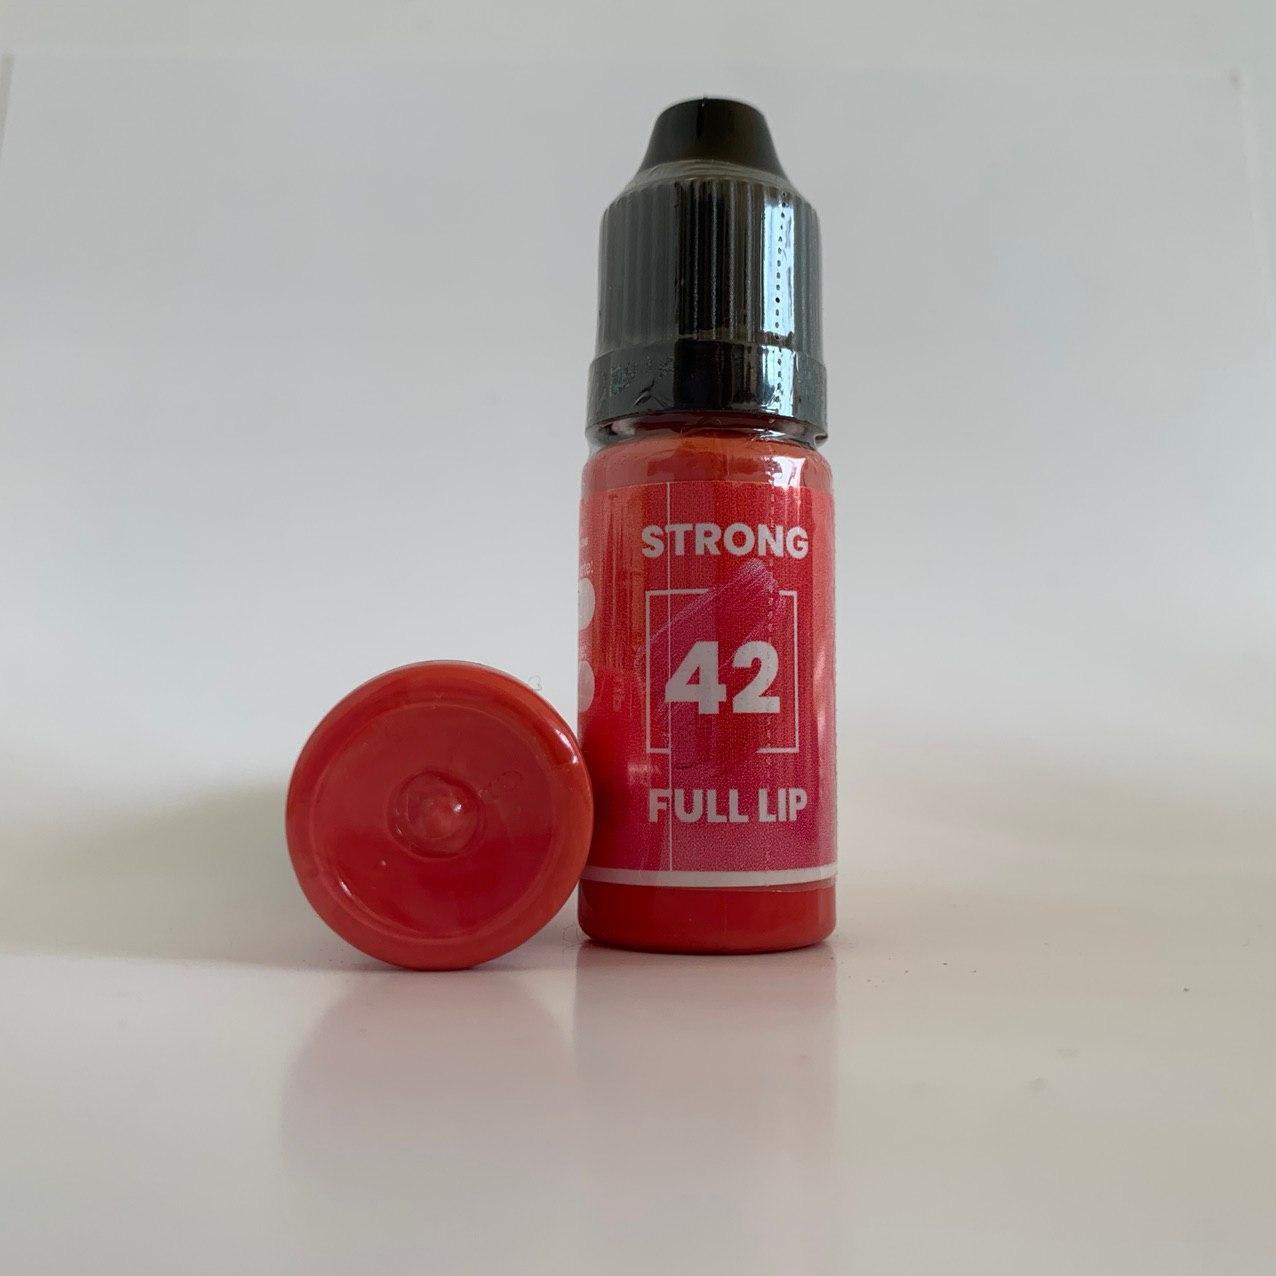 Пігмент Magic Cosmetic Strong Full Lip #42, 5мл